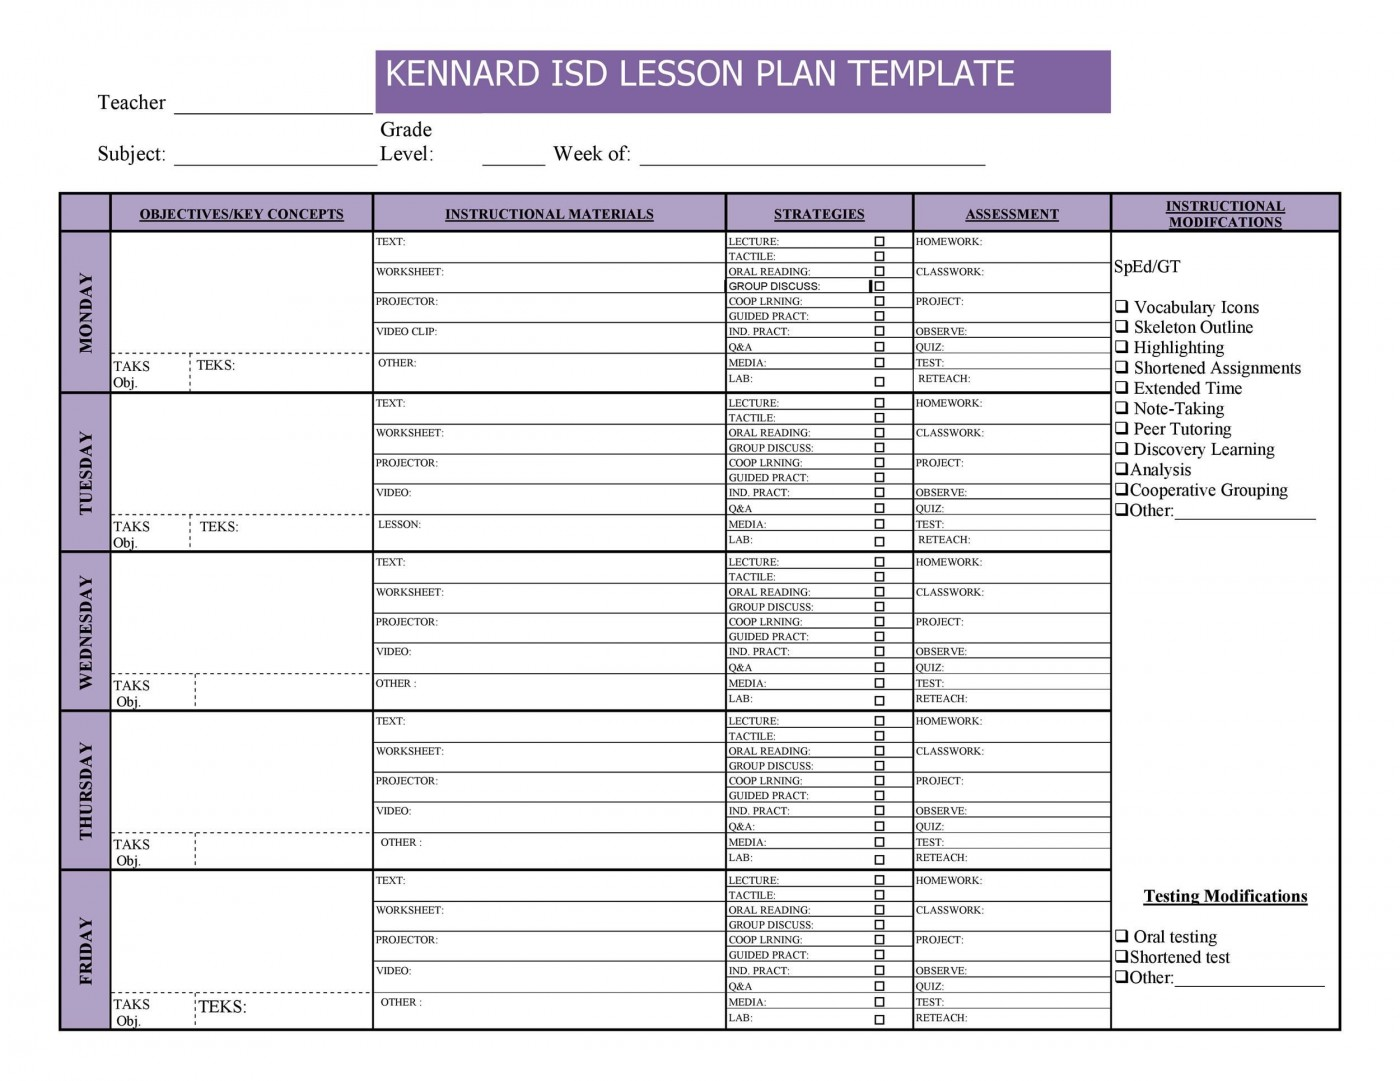 005 Stupendou Weekly Lesson Plan Template Editable High Resolution  Google Doc Preschool Downloadable Free1400